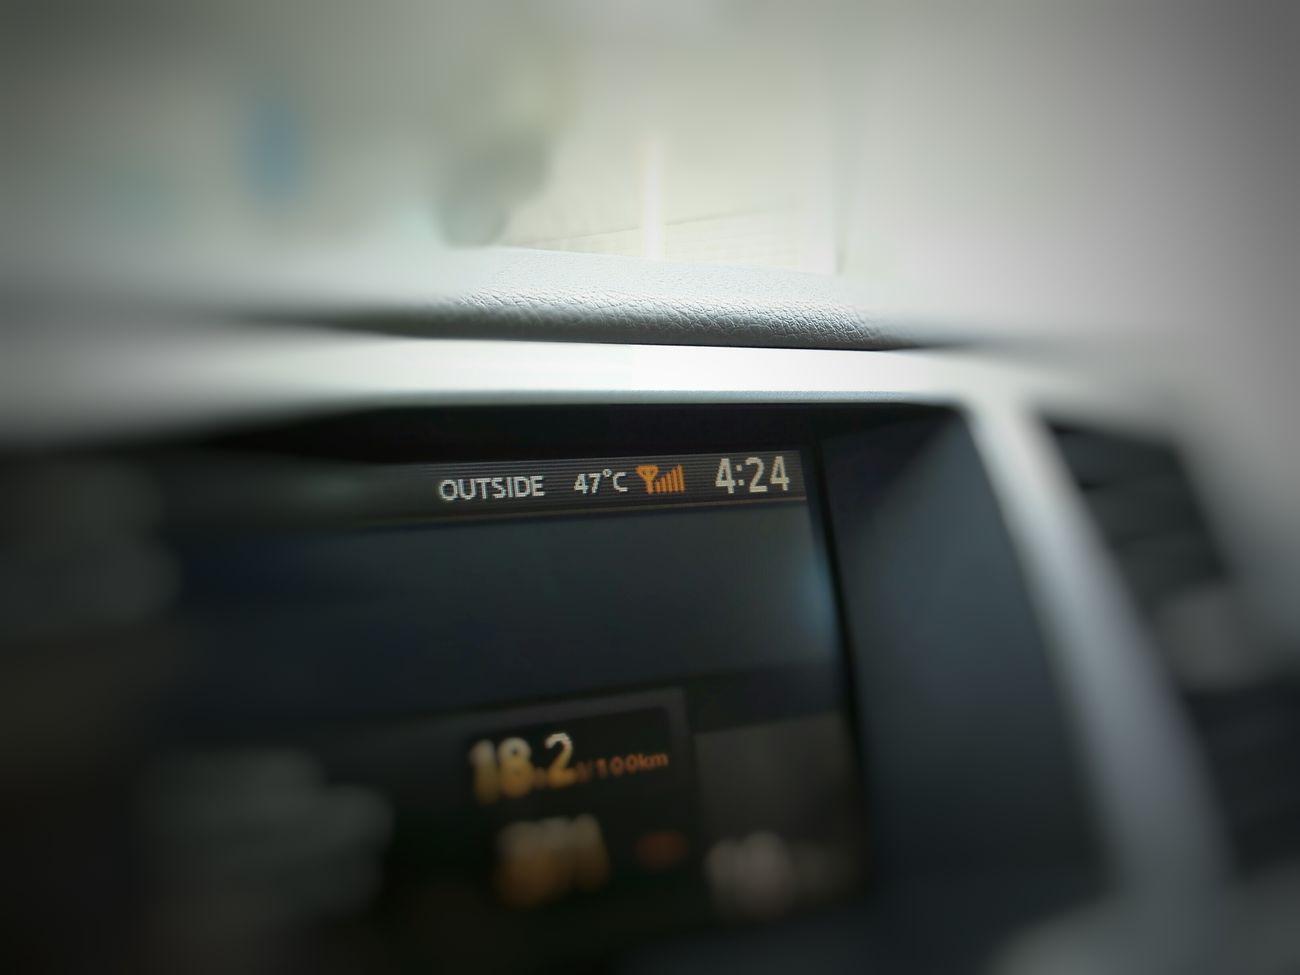 47 Celsius = 116.6 Fahrenheit Hot Day Hot Tempreture Weather Summer Summertime EyeEm Best Shots Celsius Fahrenheit